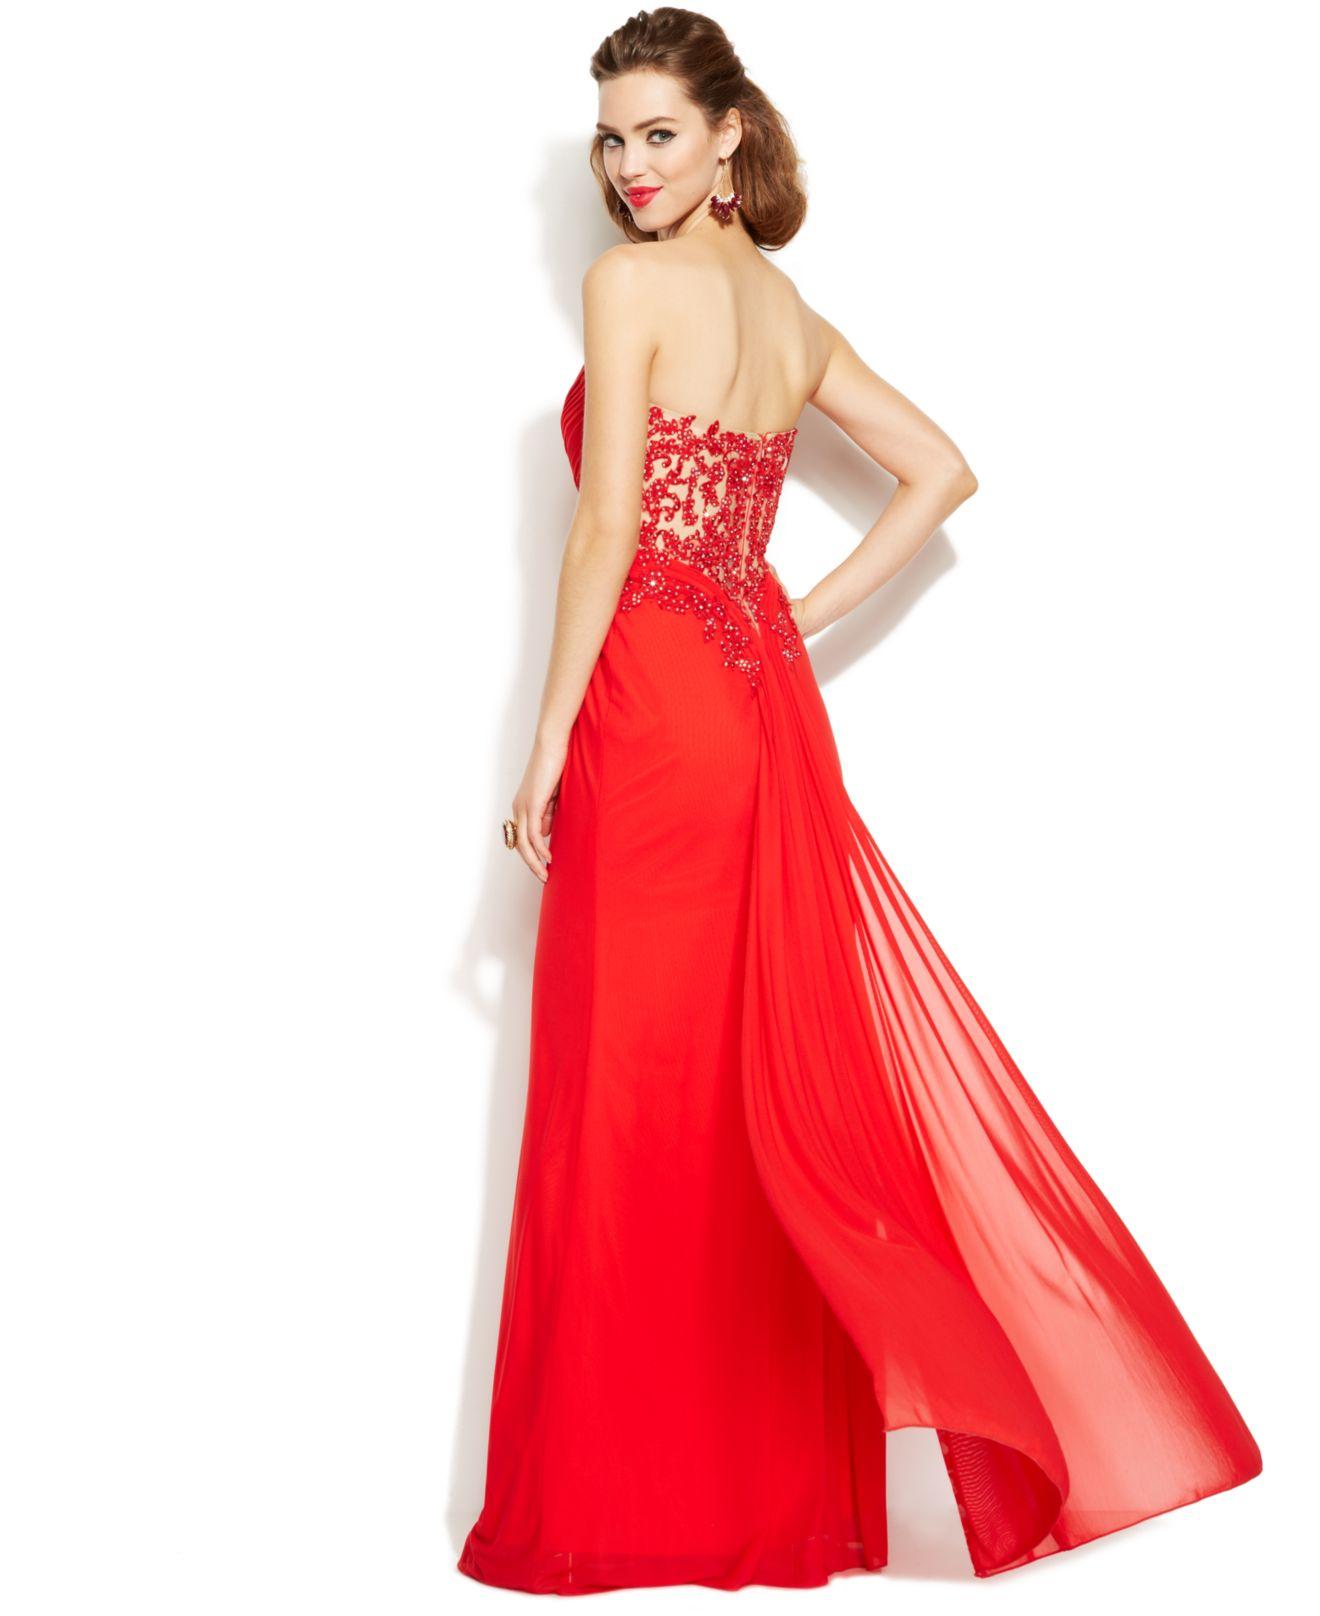 Xscape Red Dress